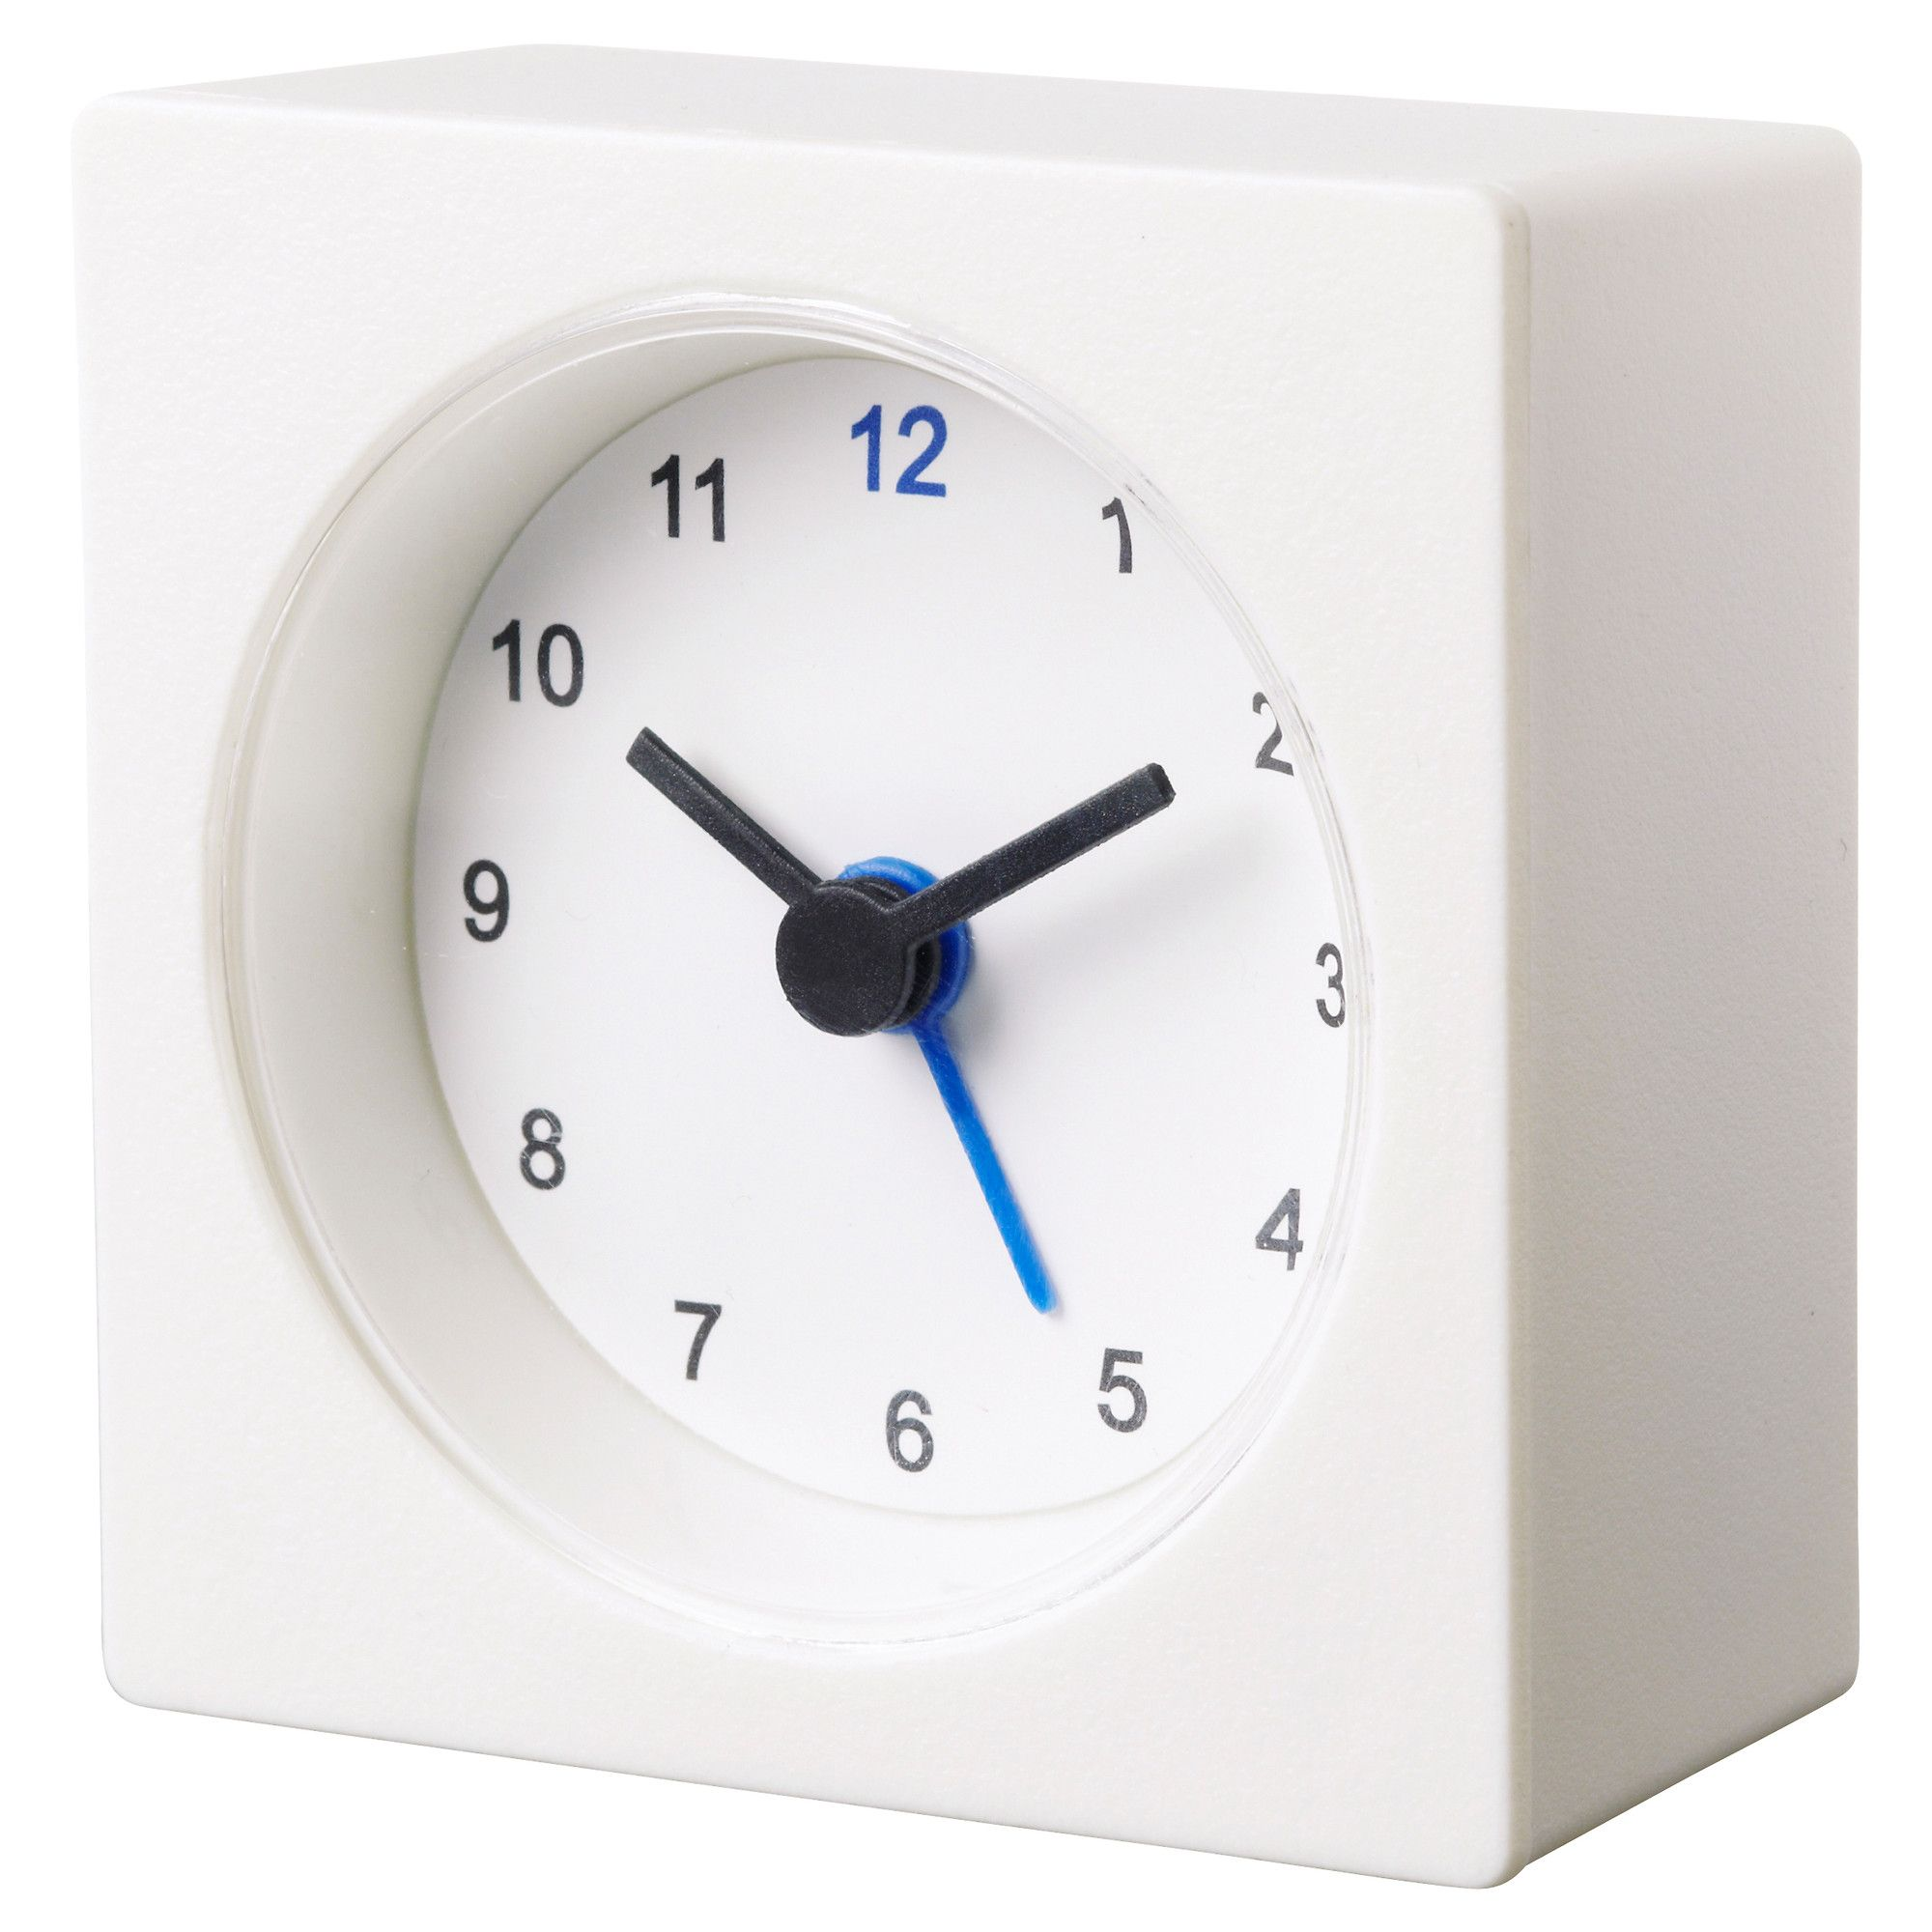 Väckis Alarm Clock White  Alarm Clocks Clocks And Ikea Bathroom Beauteous Small Wall Clock For Bathroom Decorating Inspiration